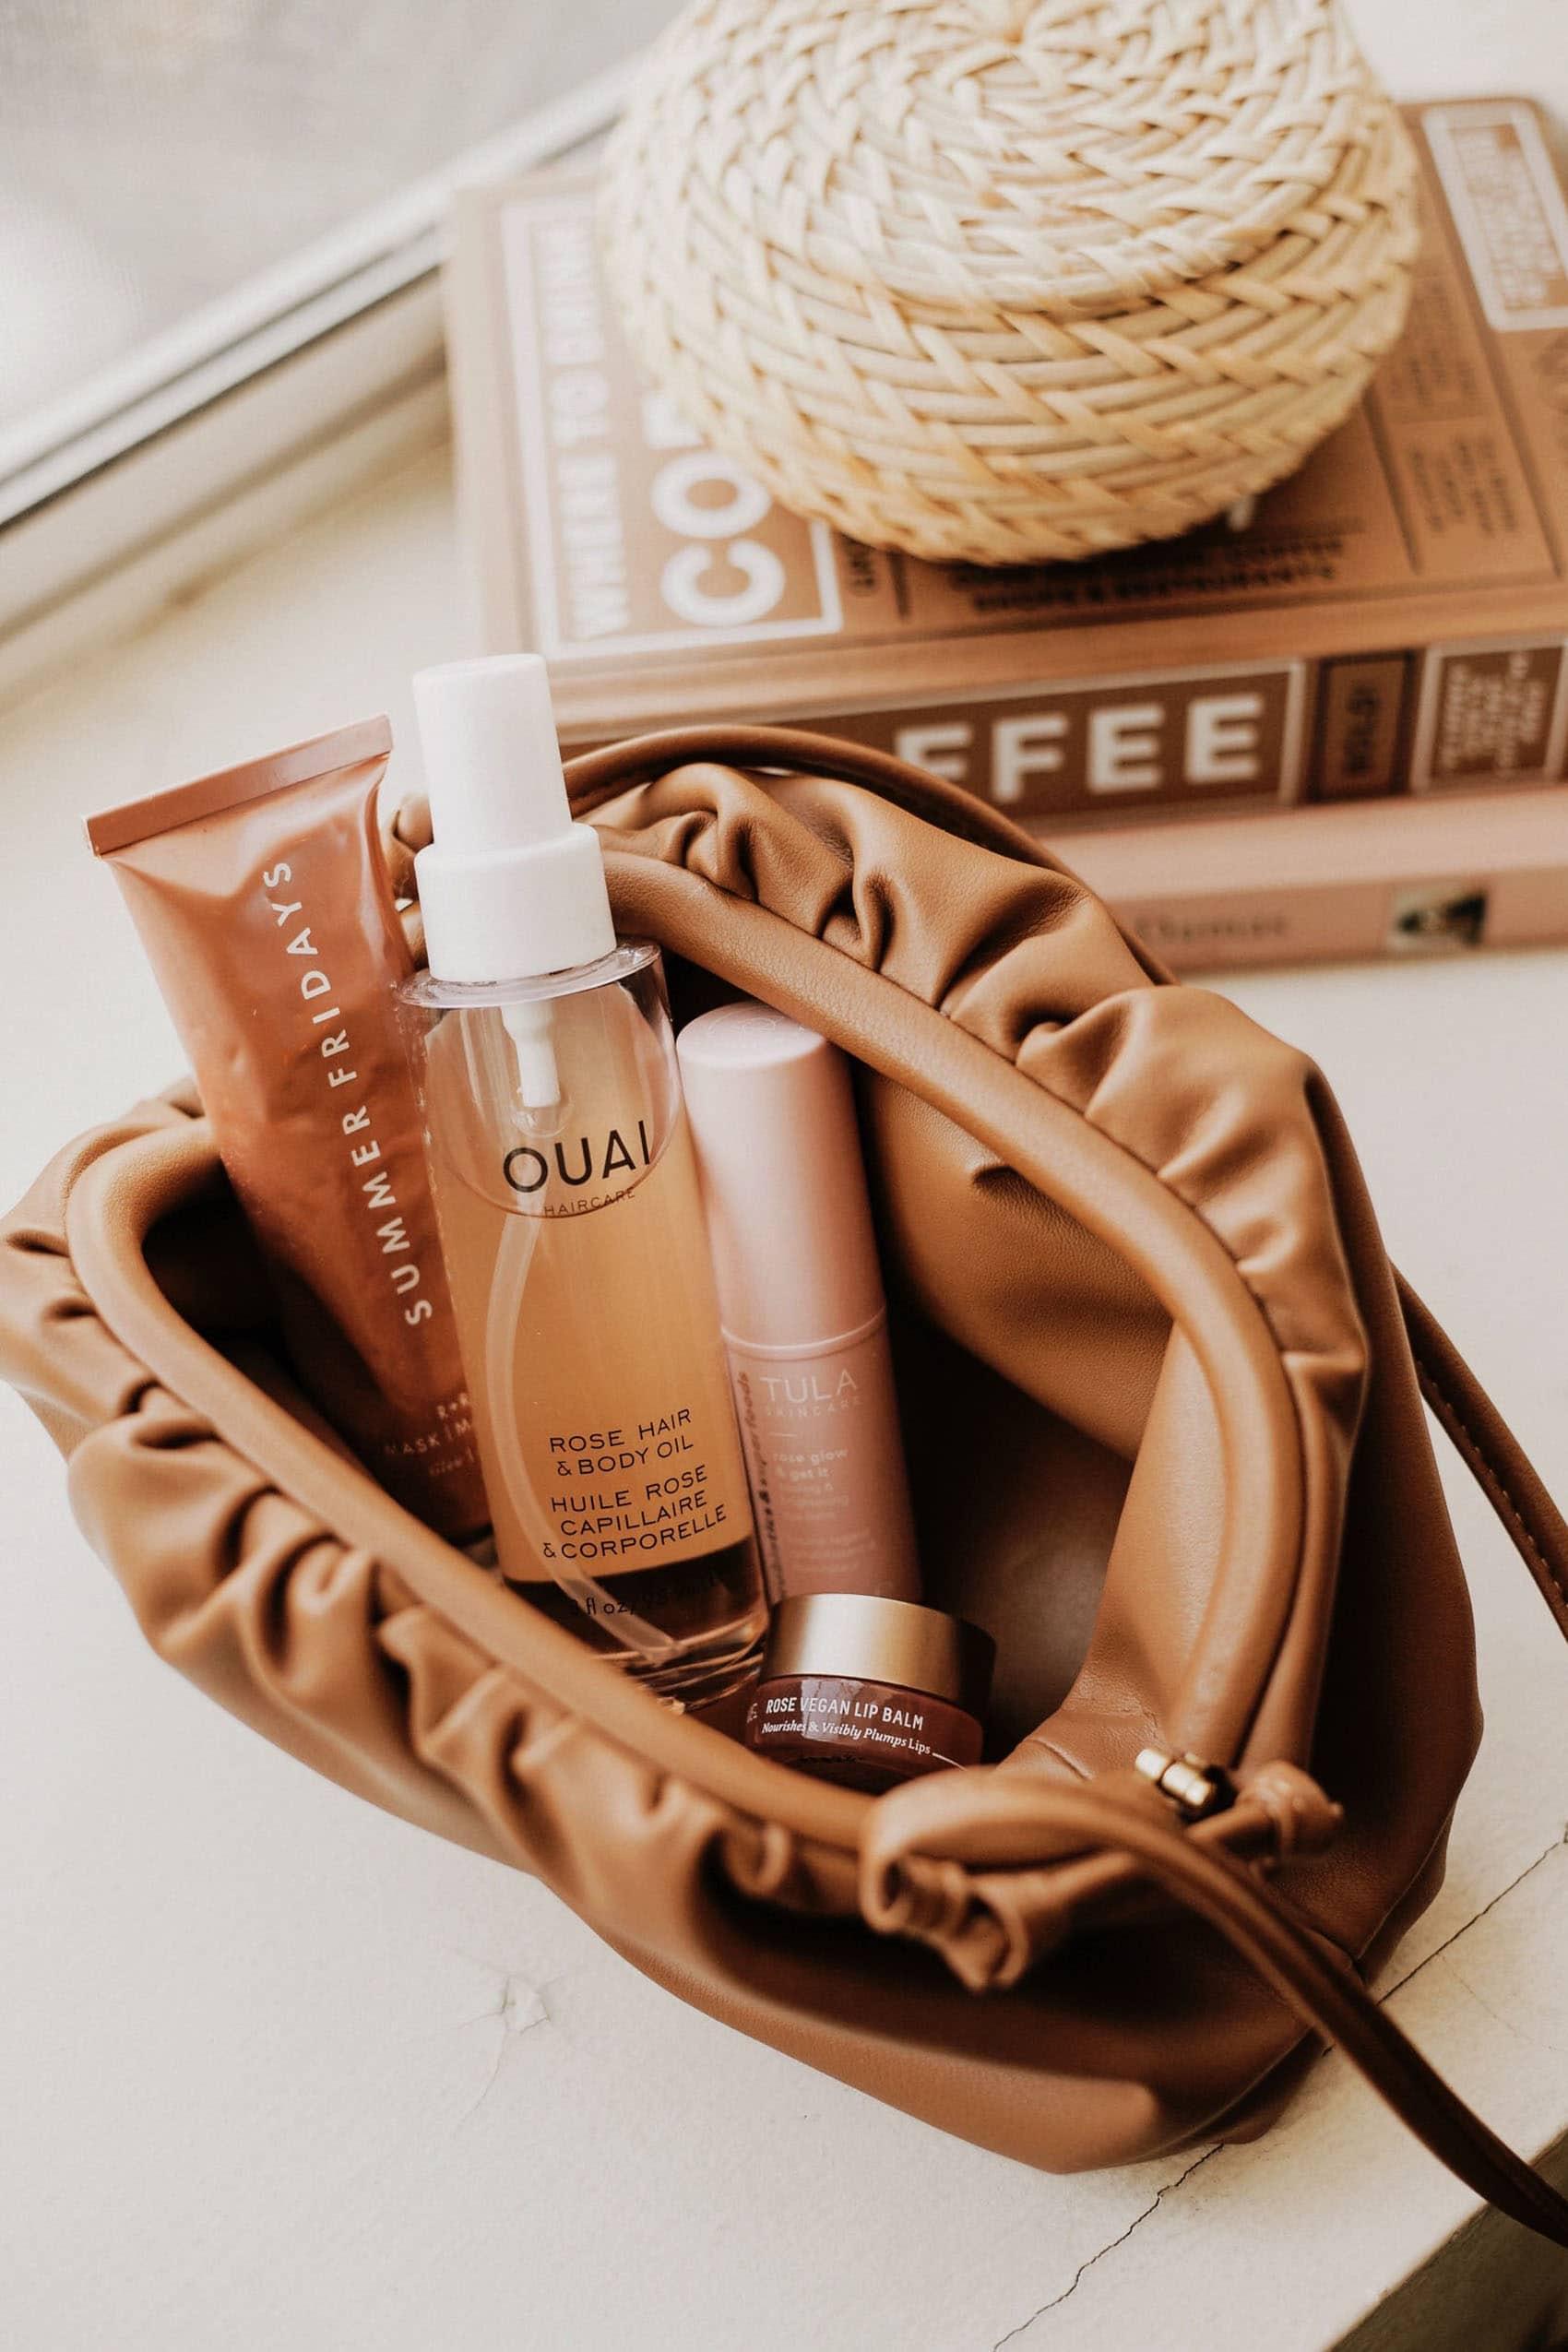 Summer Fridays, Ouai, Tula, Biossance, Rose Skincare Products